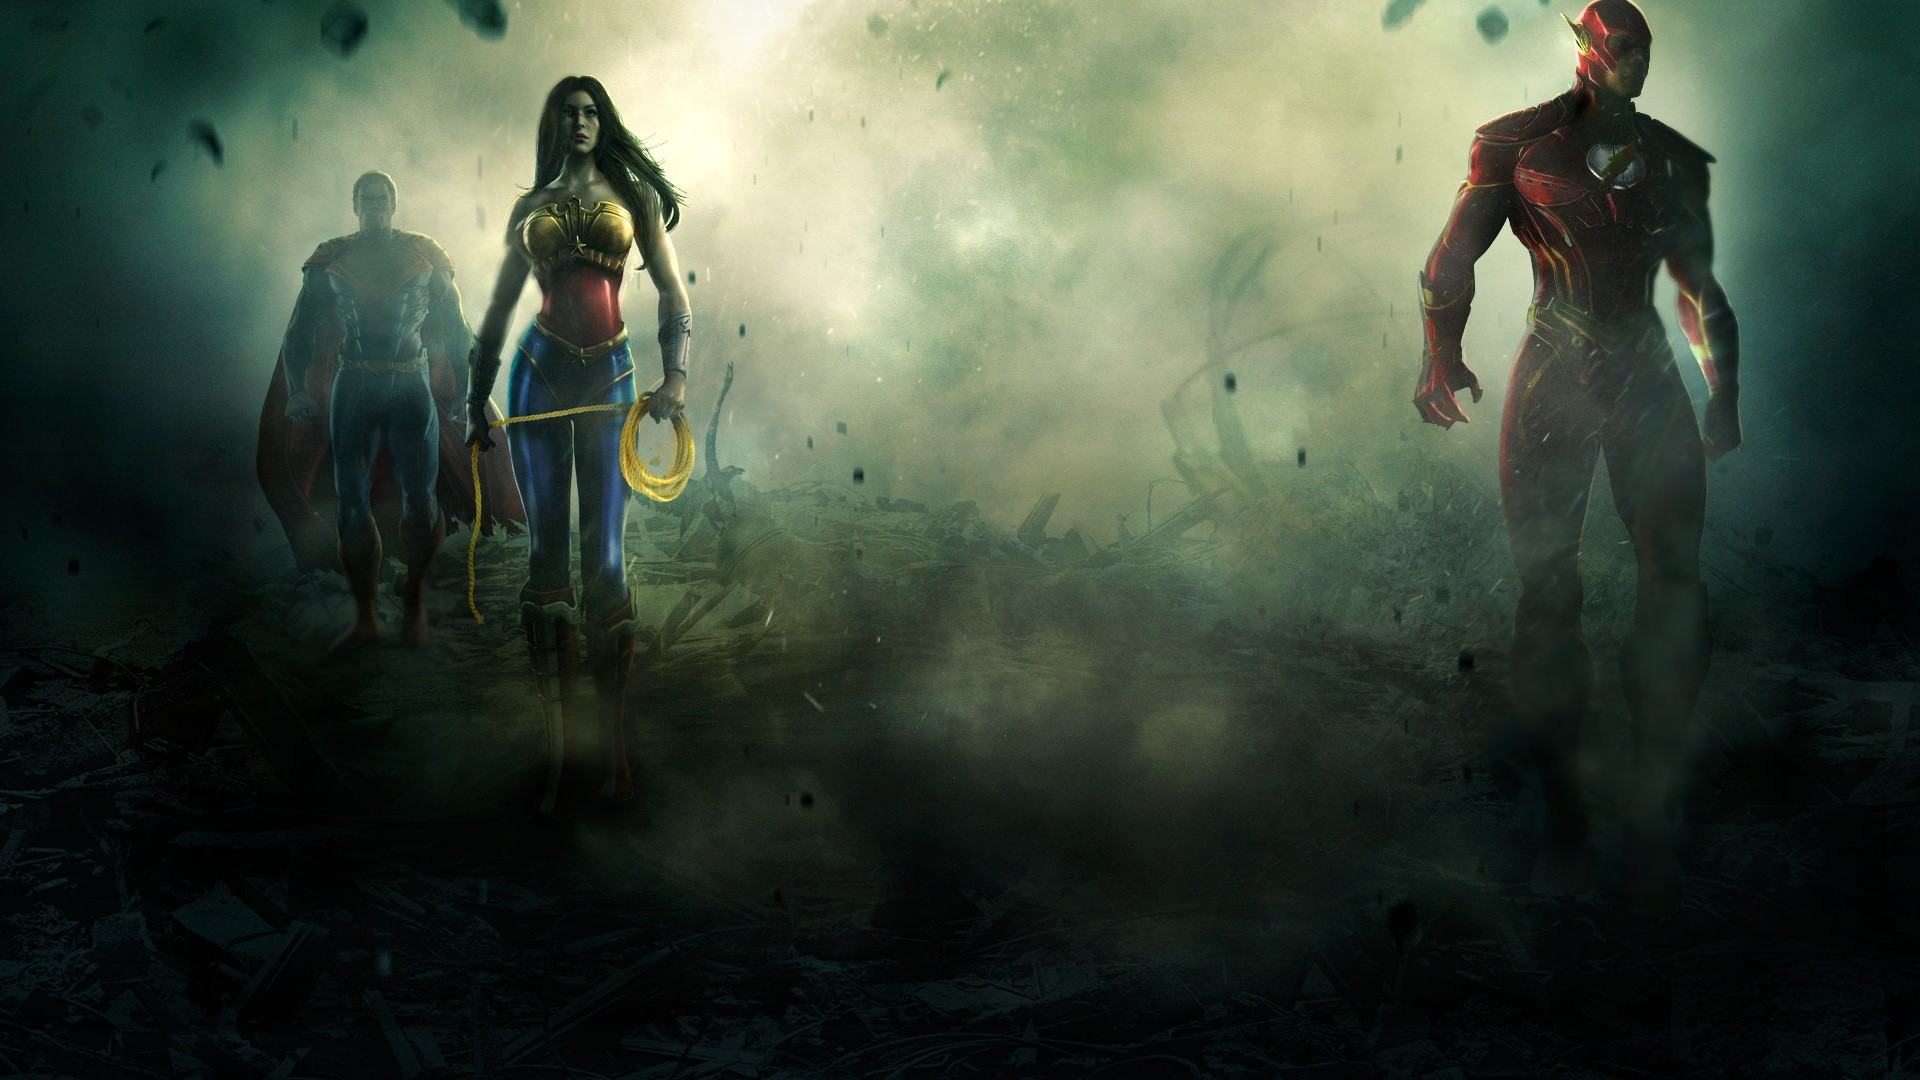 Superman, Wonder Woman ,Flash wallpaper so you can download wallpaper .